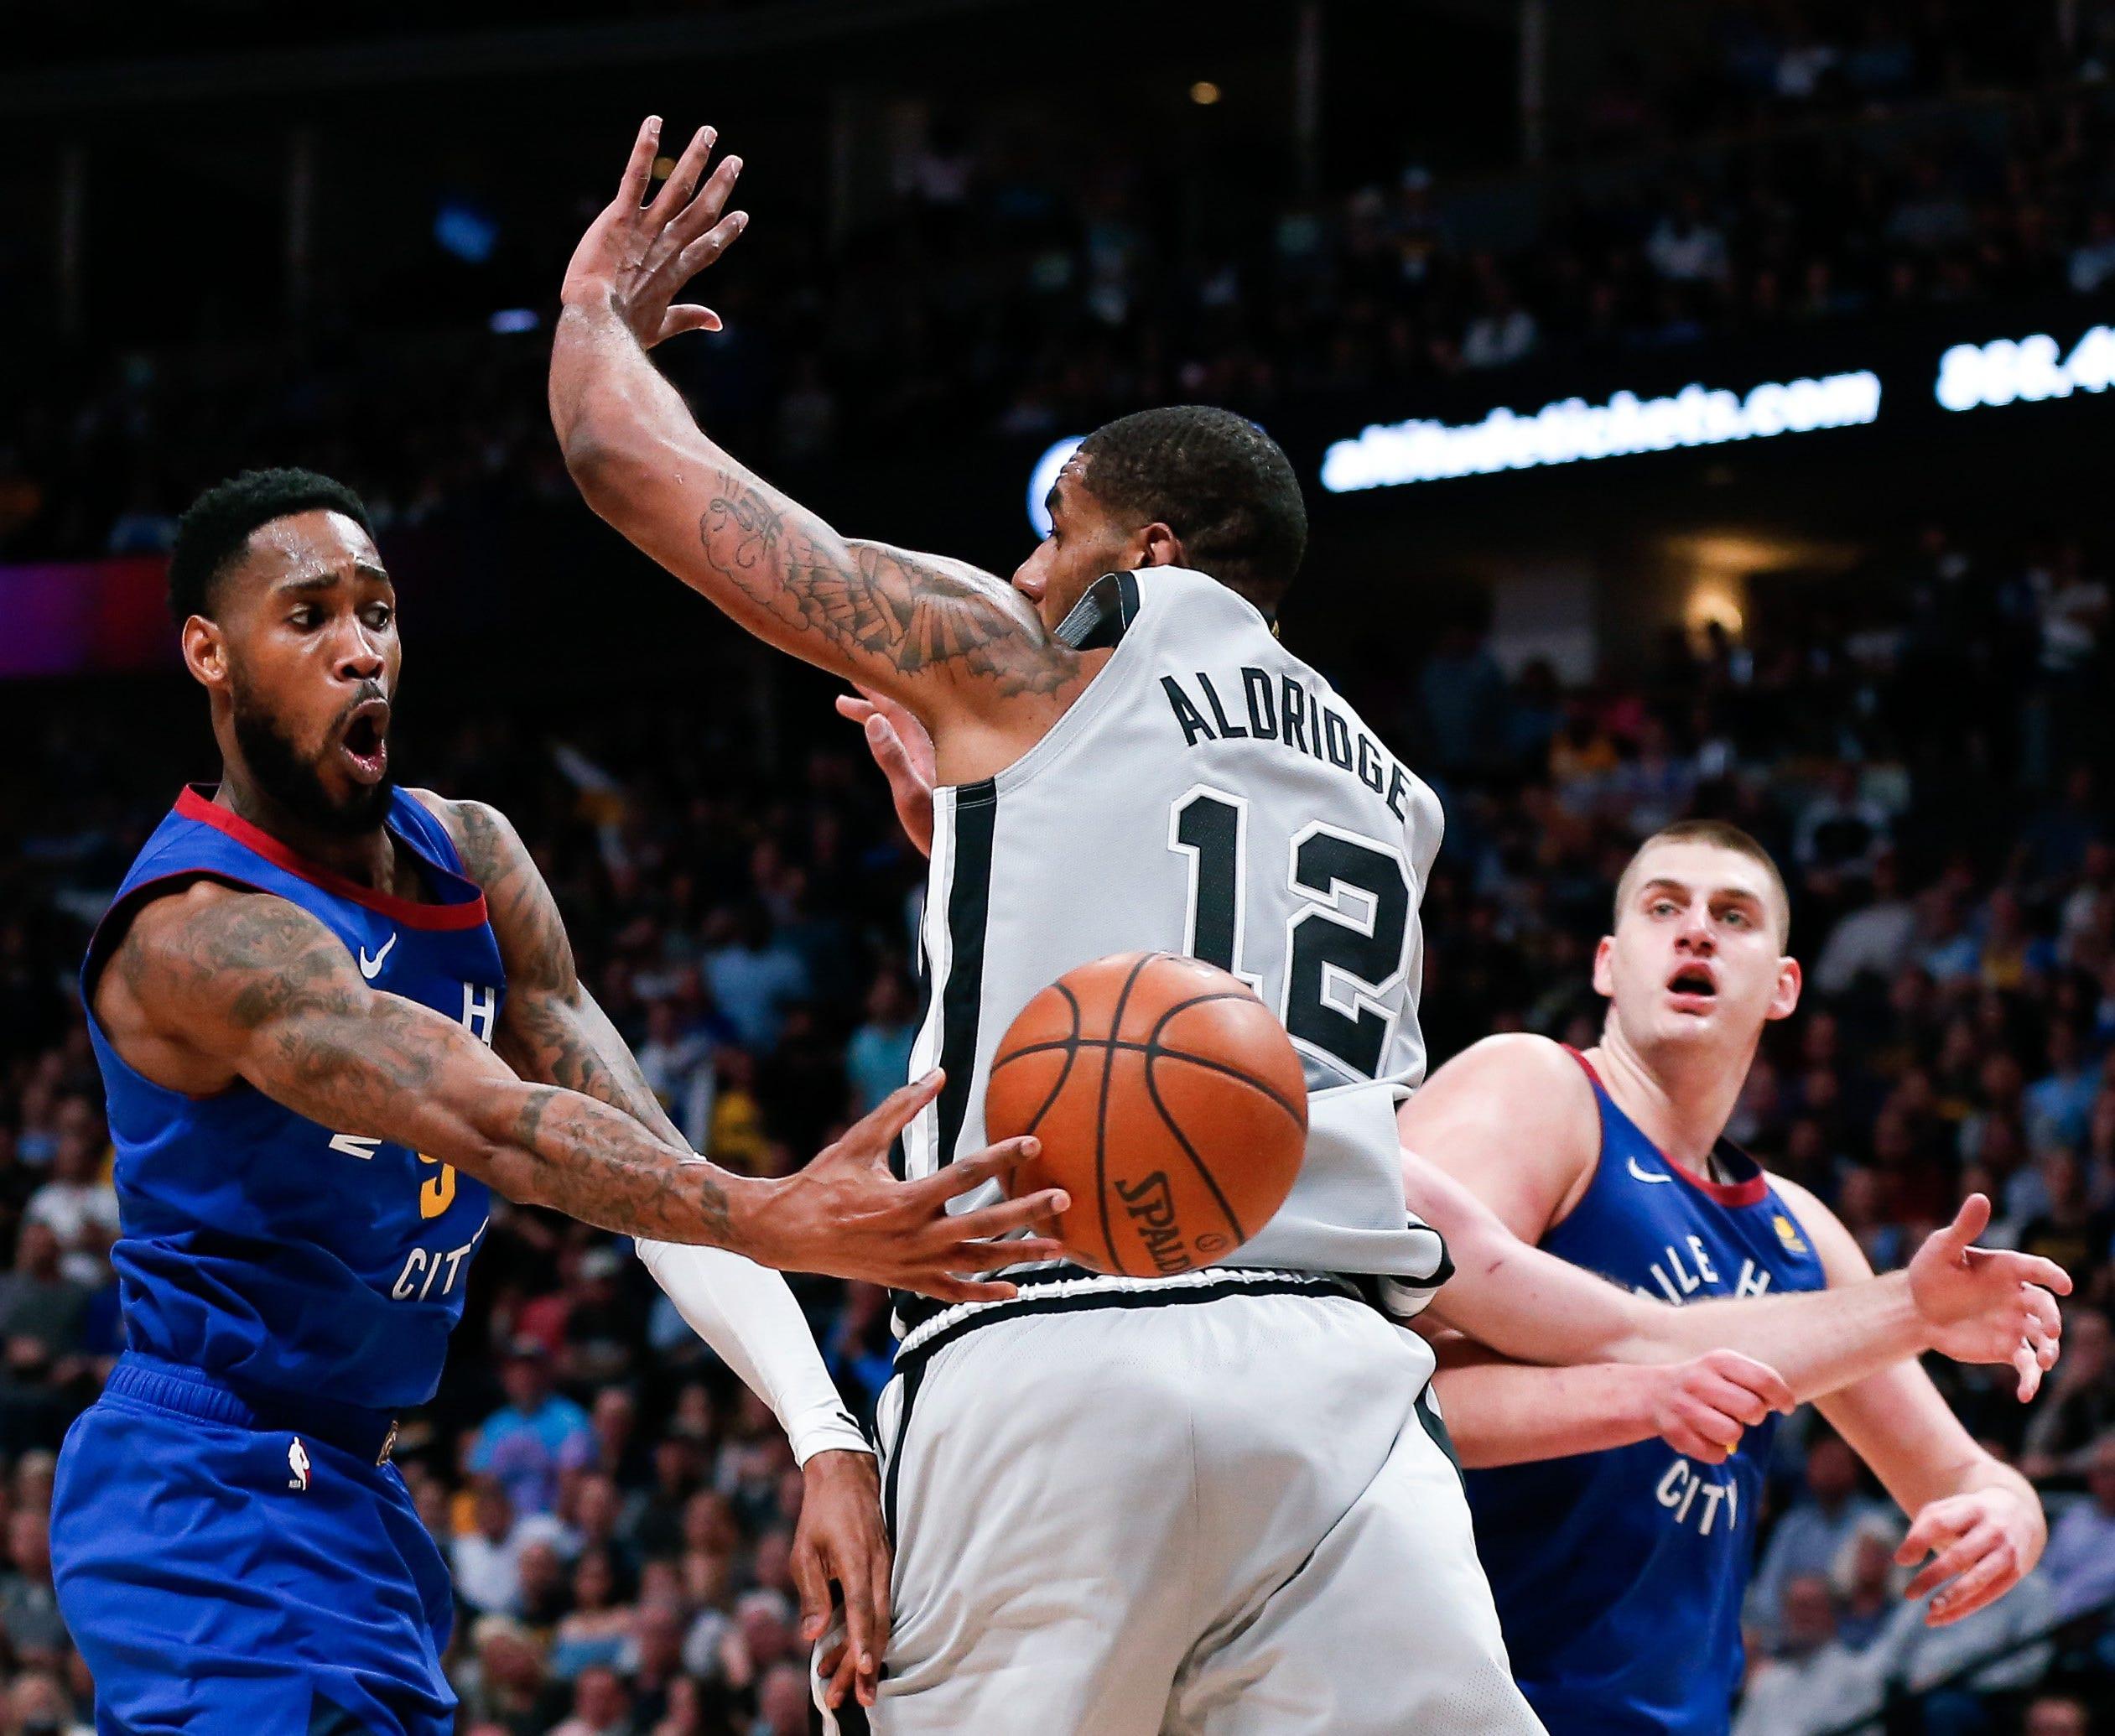 April 23: Denver Nuggets guard Will Barton (5) passes the ball to center Nikola Jokic (15) around San Antonio Spurs center LaMarcus Aldridge during Game 5 at the Pepsi Center.